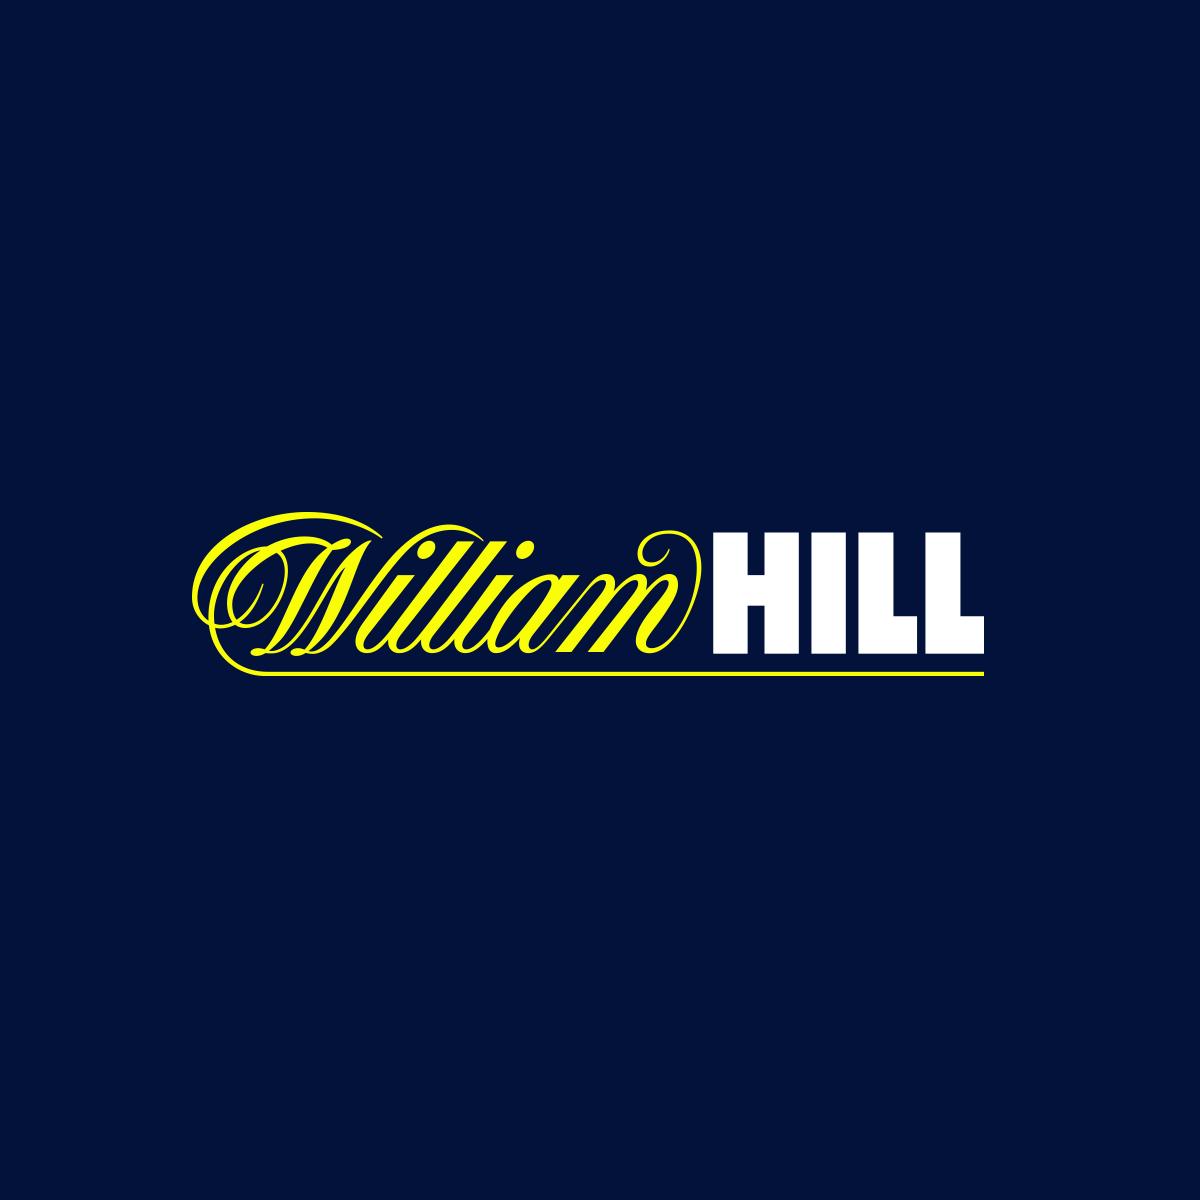 William hill зеркало сайта